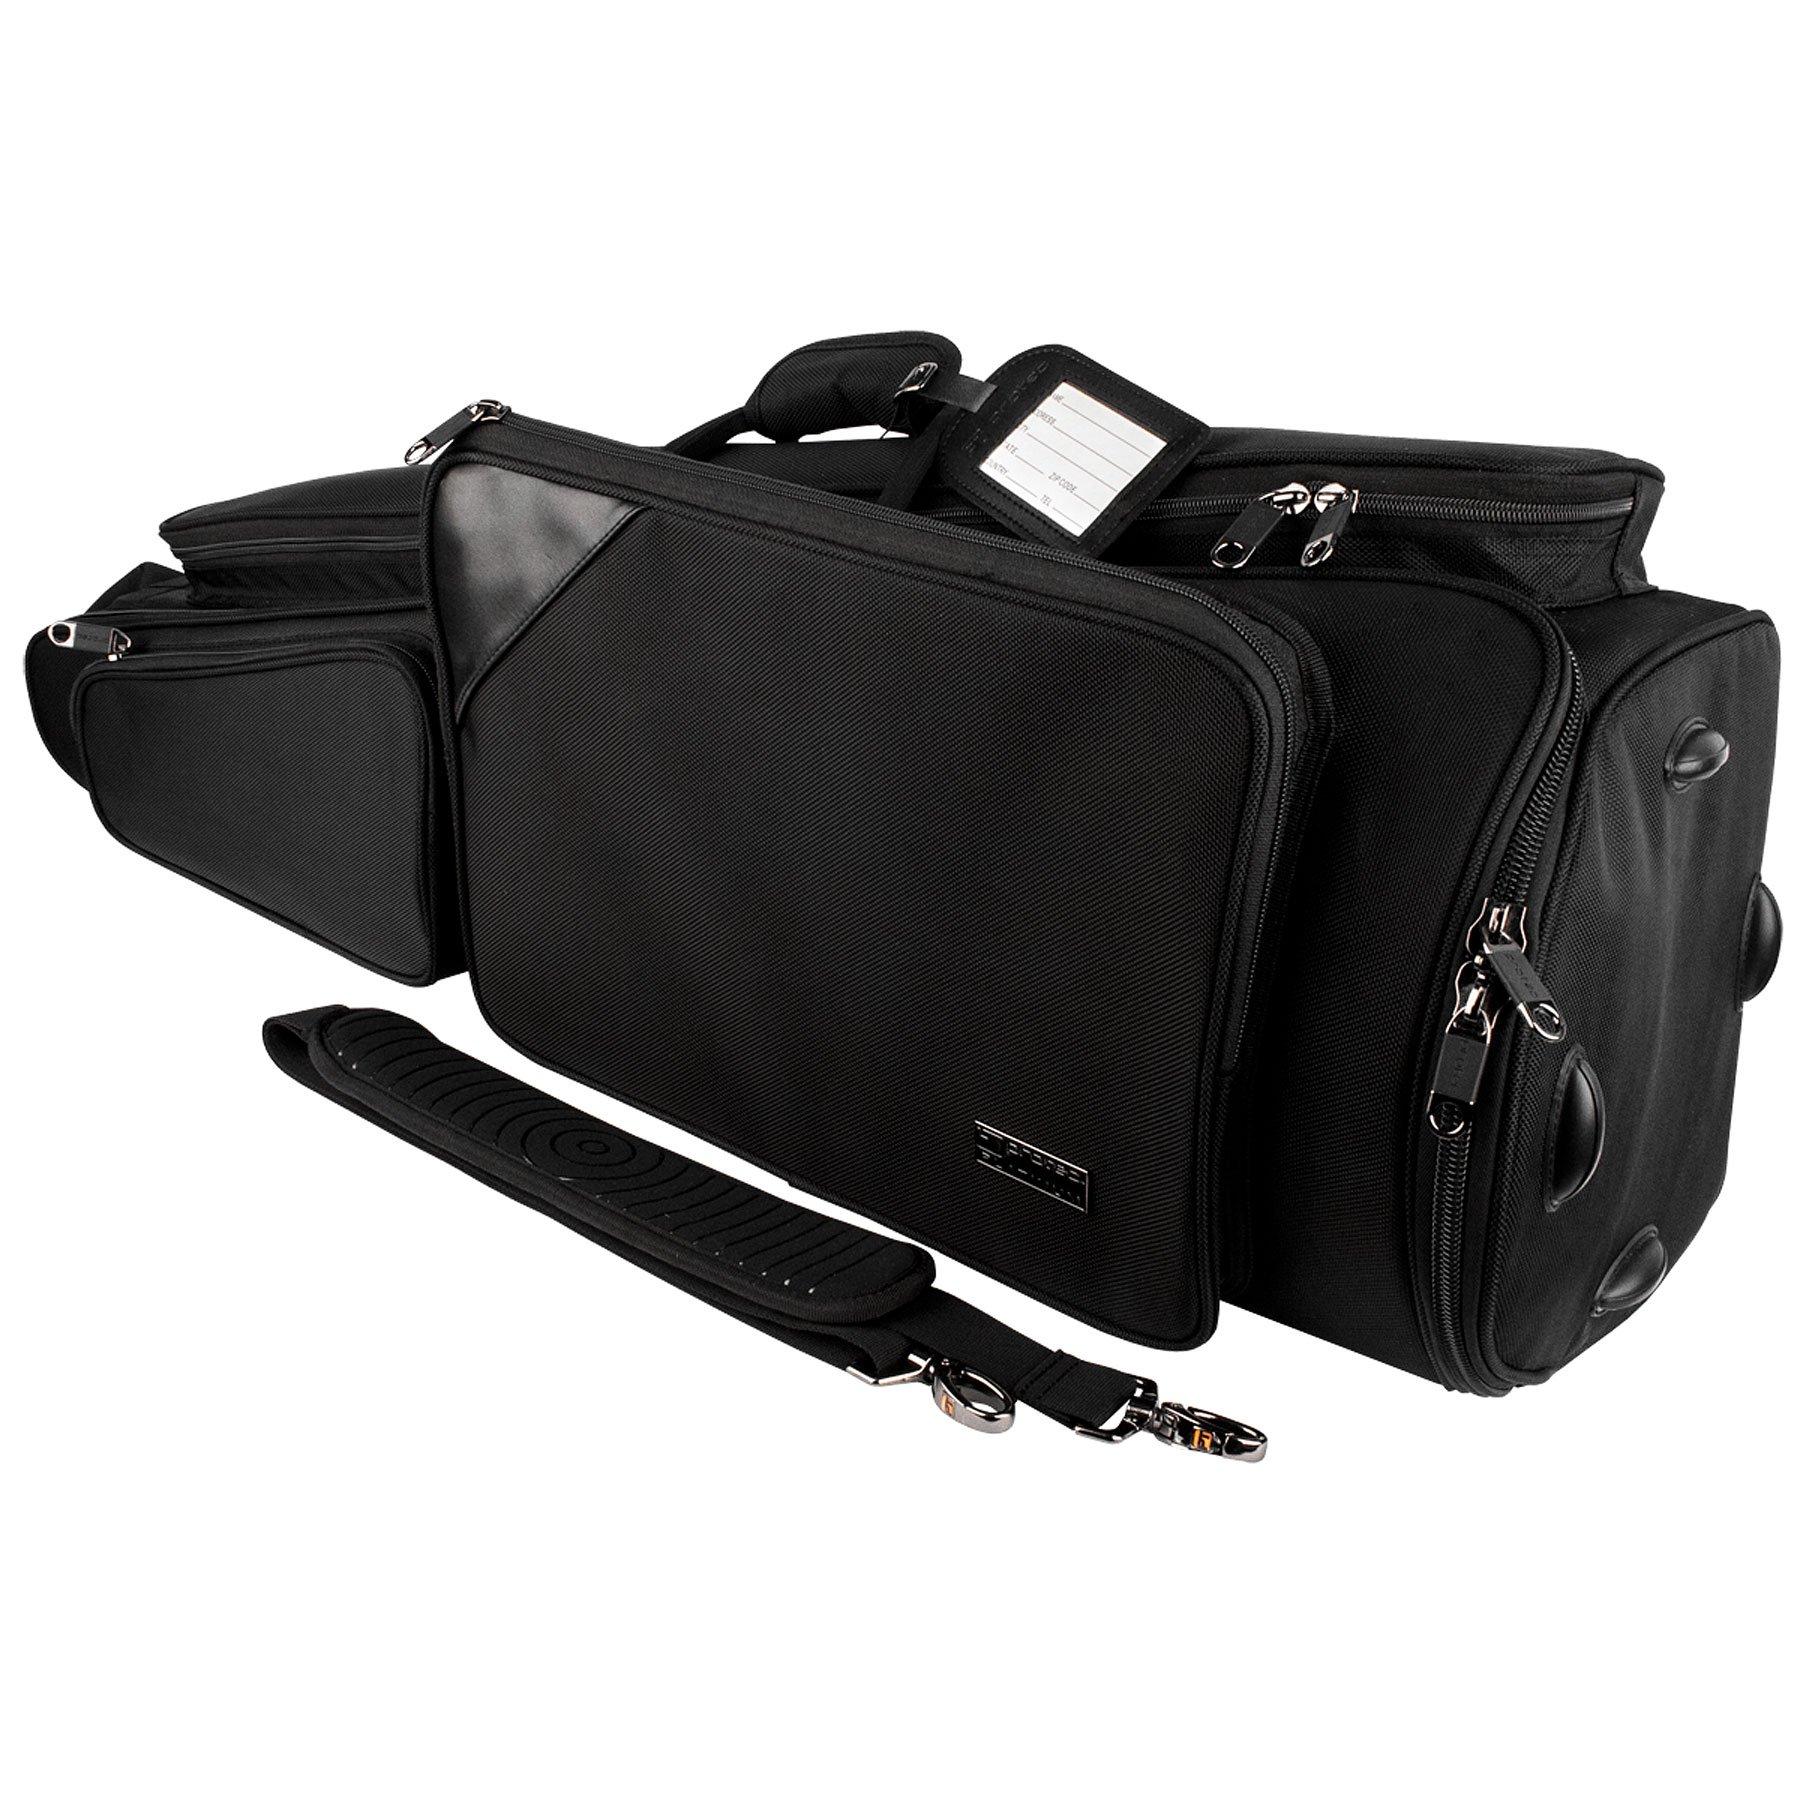 Protec PL239 Platinum Series Tenor Trombone Gig Bag by Pro Tec (Image #1)